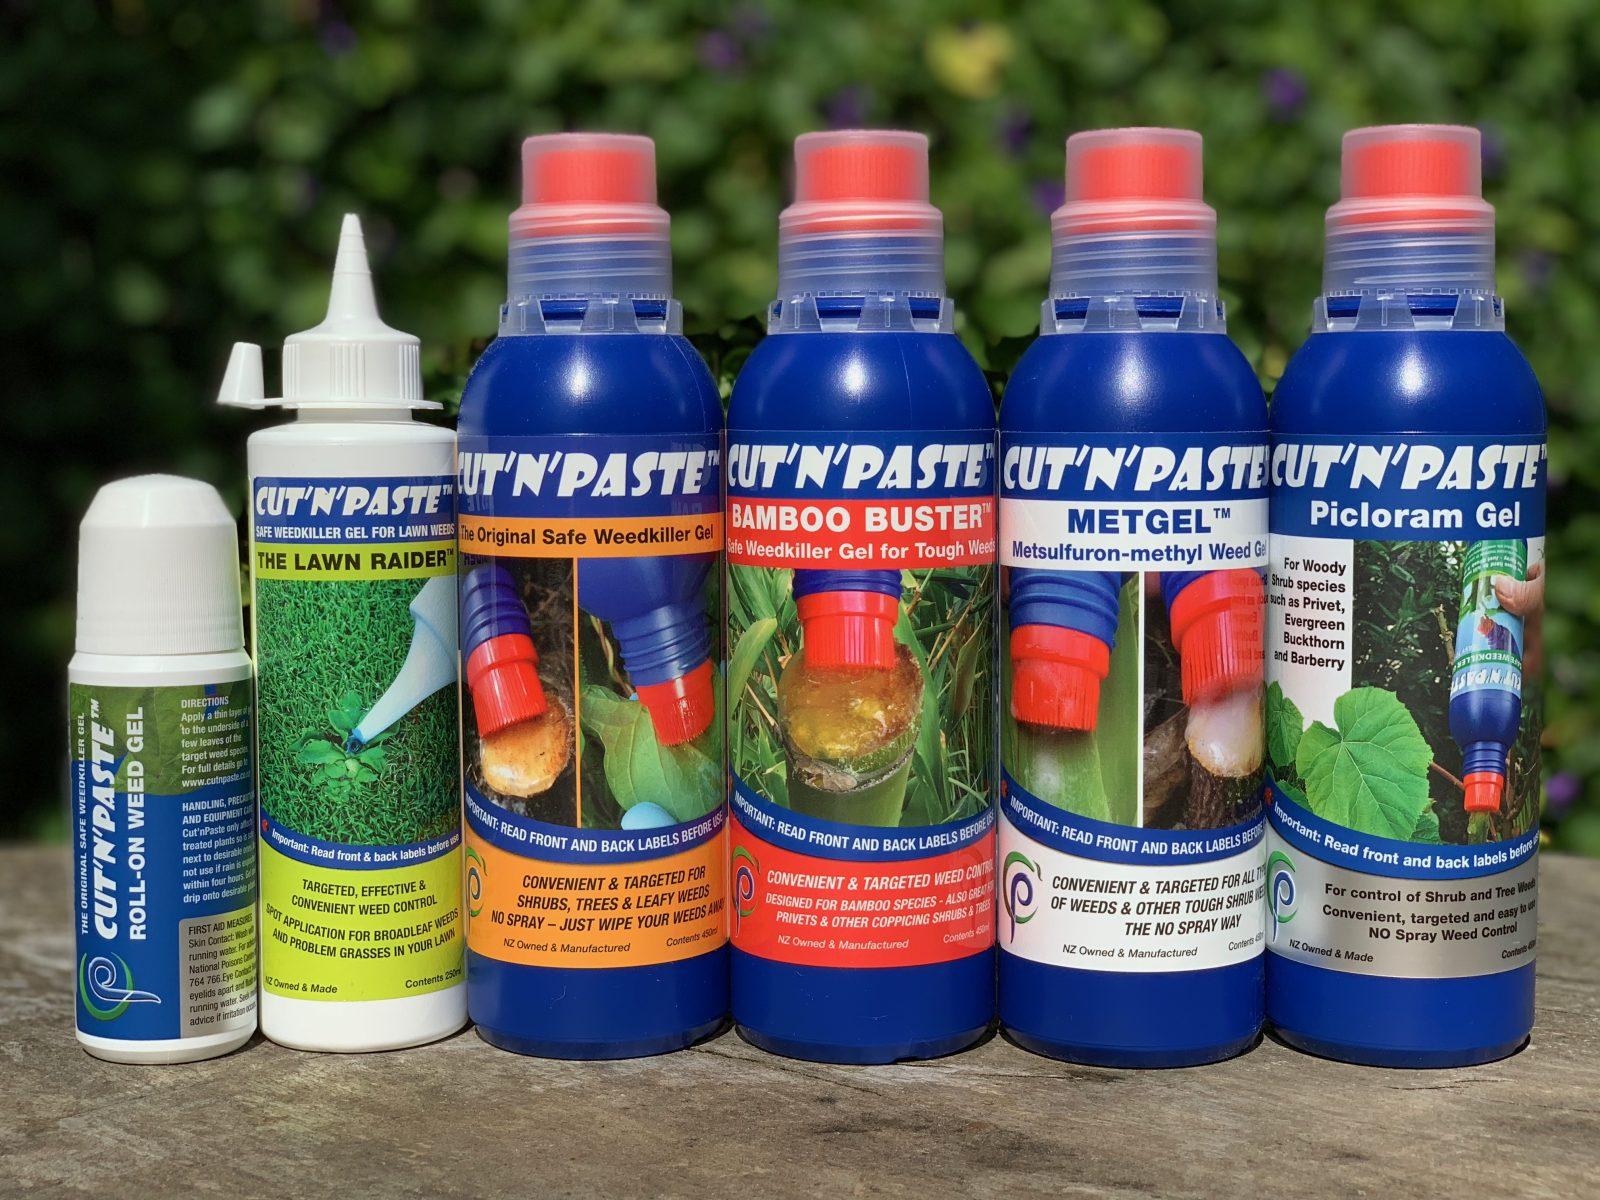 Cut'n'Paste Product Range 2018